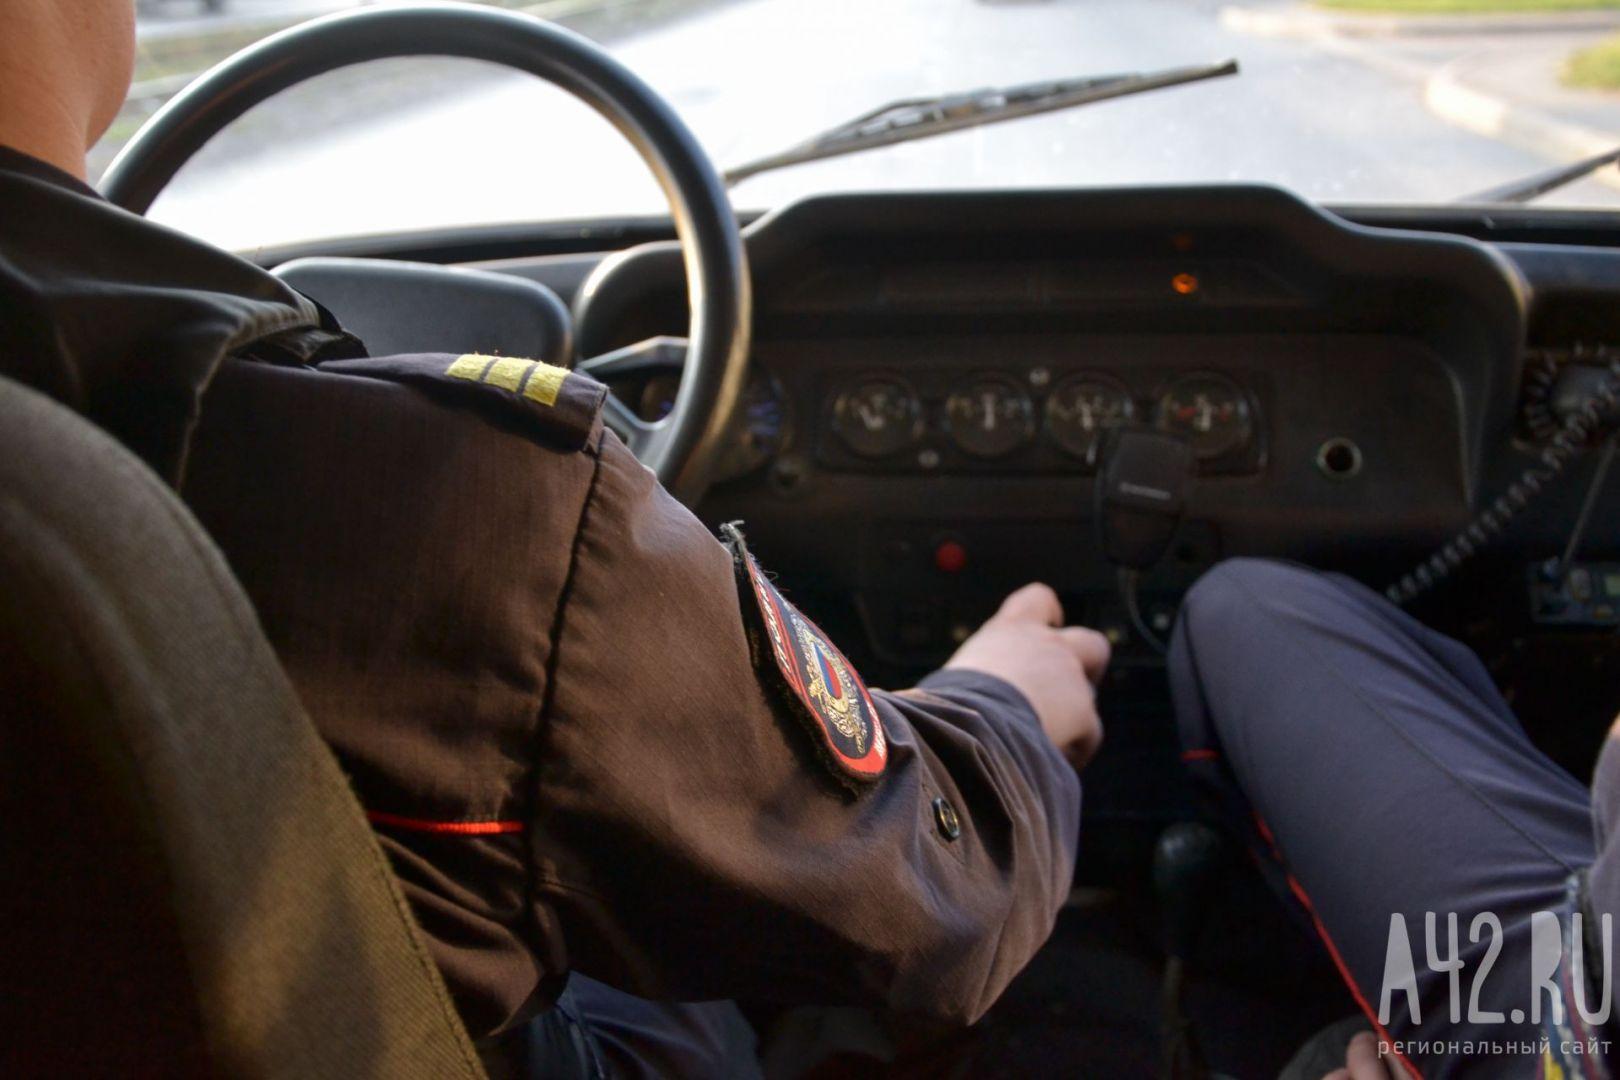 Два кузбассовца избили семейную пару, похитили уних деньги и Тоёта